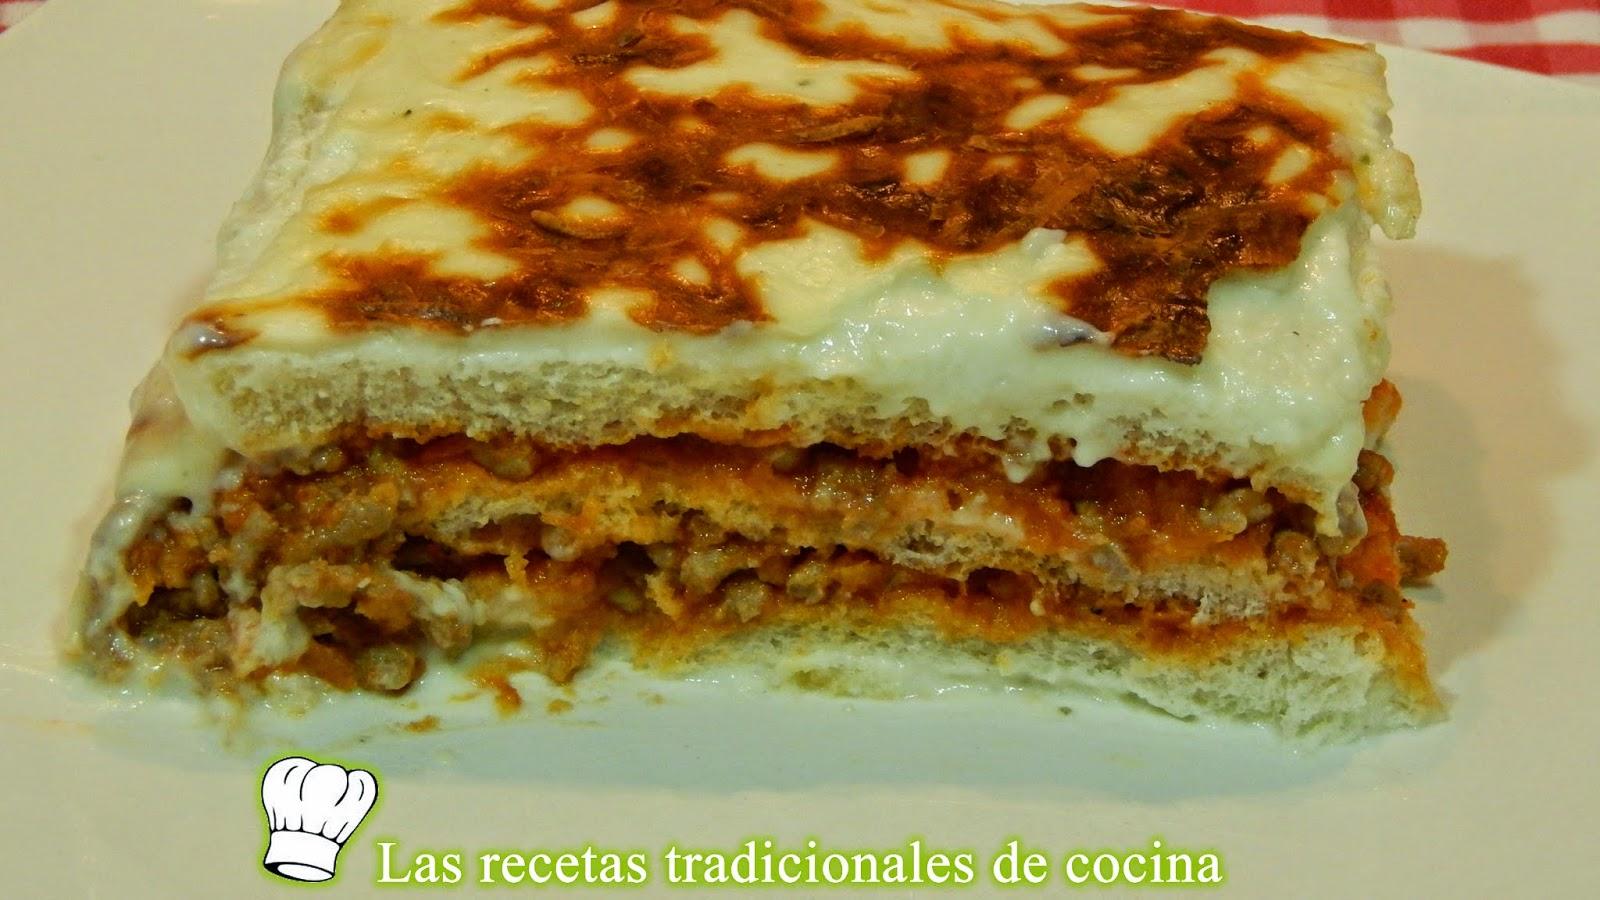 Receta de lasaa de carne con pan de molde Recetas de cocina con